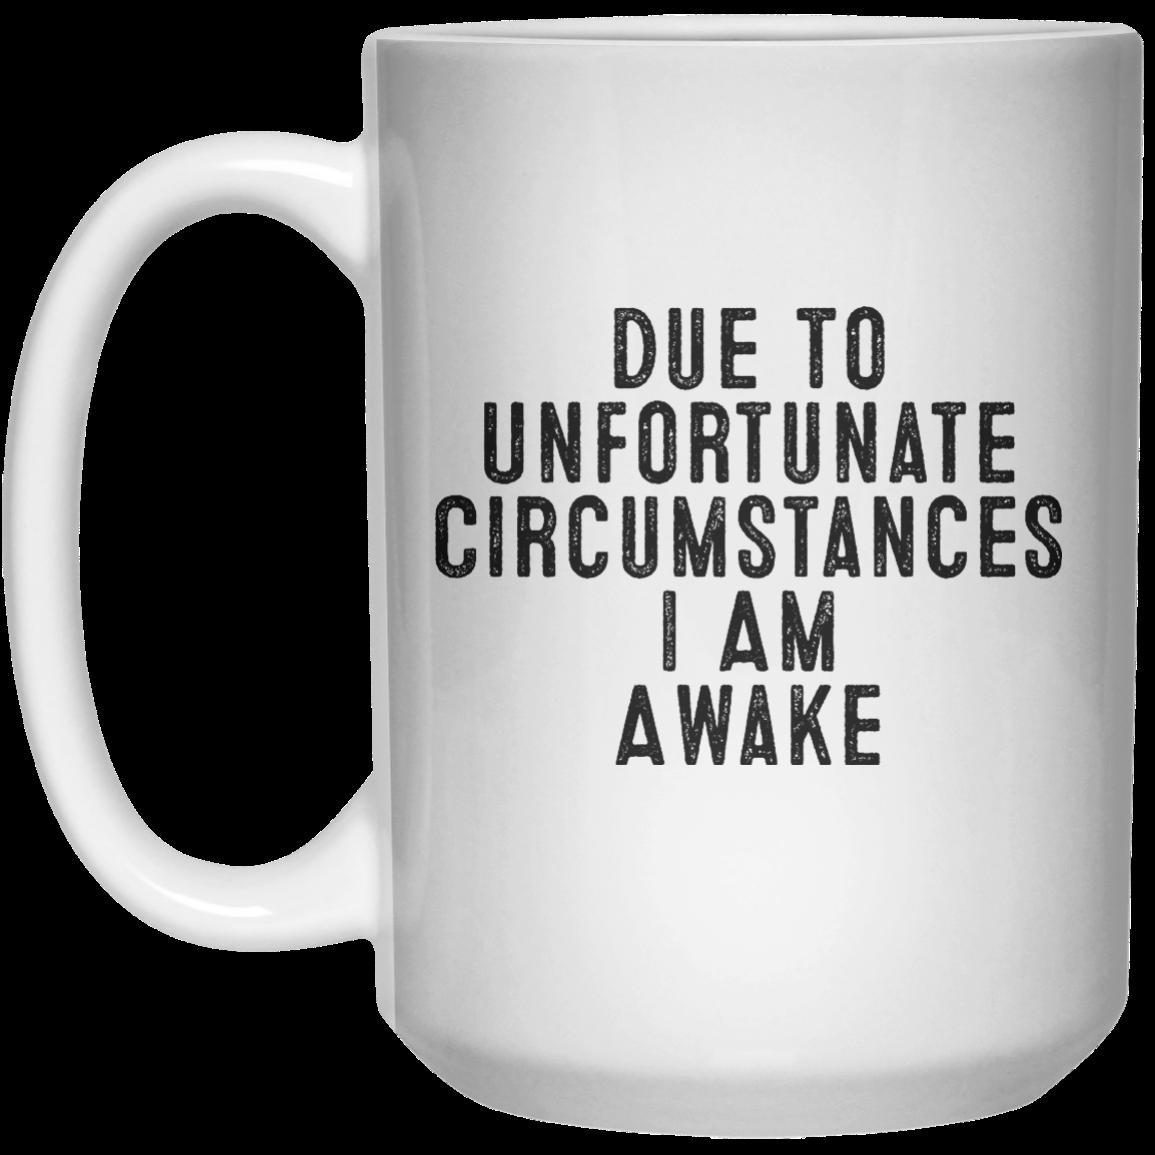 Due To Unfortunate Circumstances I Am Awake Mug Mug 15oz Mugs Cute Mugs Glass Slipper